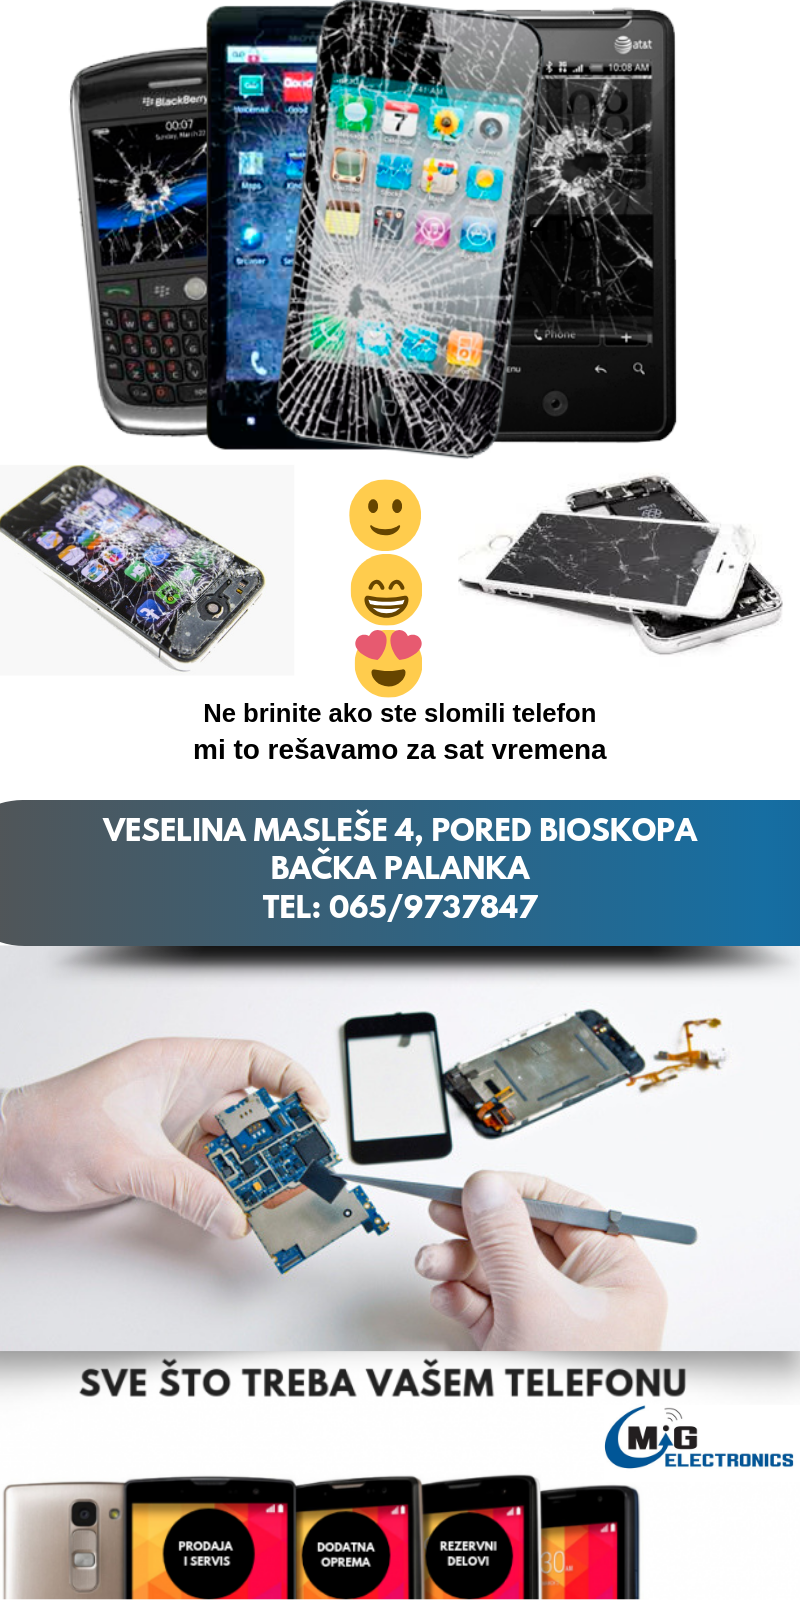 servis mobilnih telefona mig electronich bačka palanka